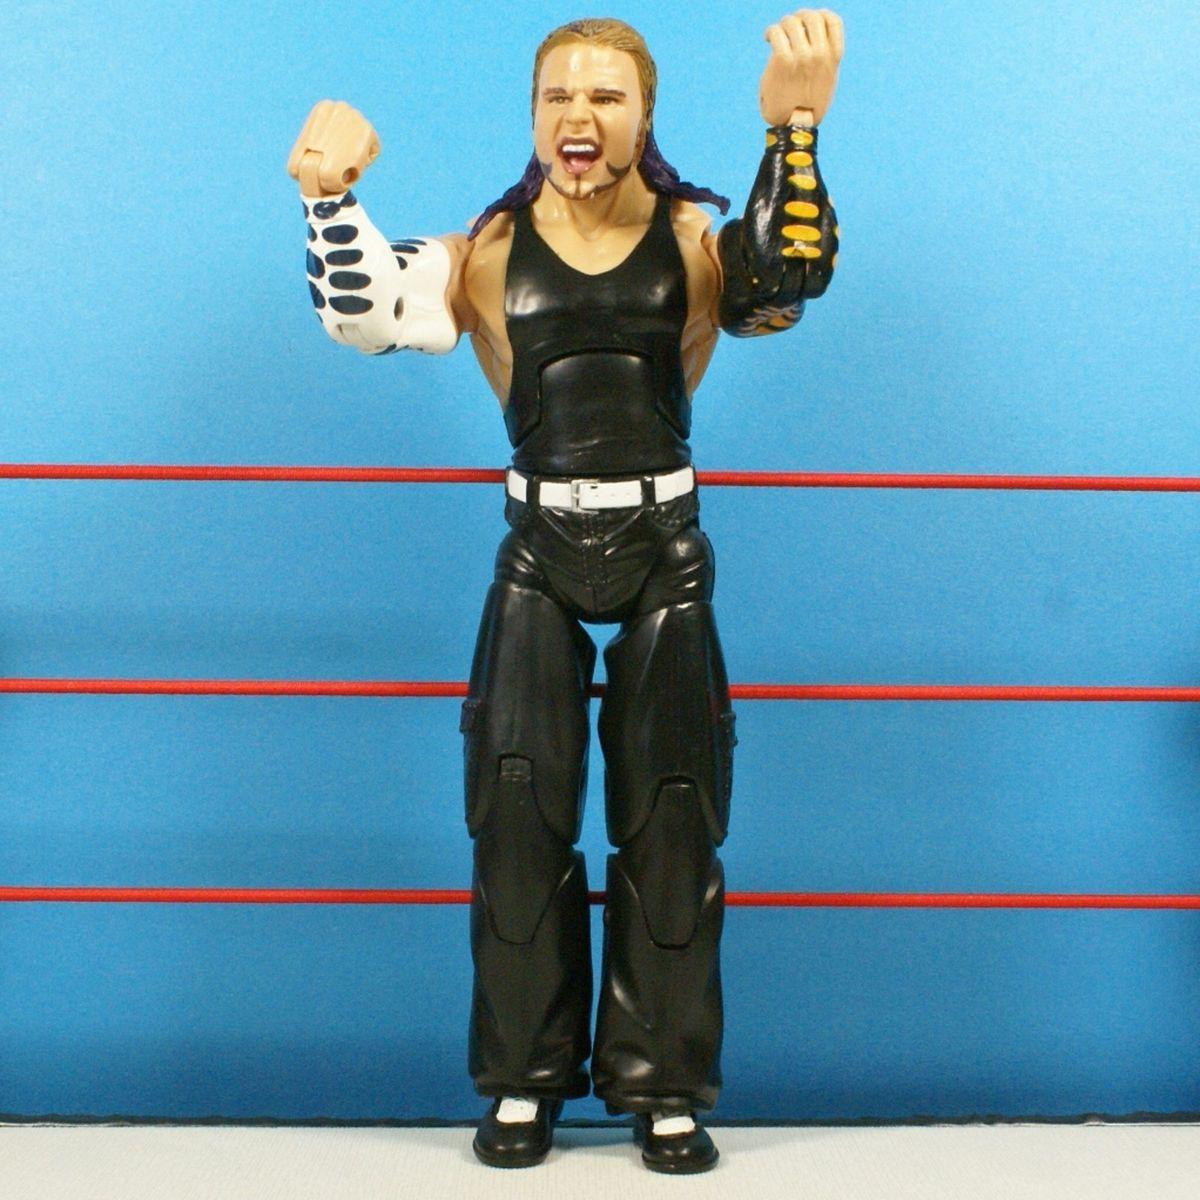 WWE Jakks Jeff Hardy Deluxe Aggression Wrestling Action Figure WWF 327